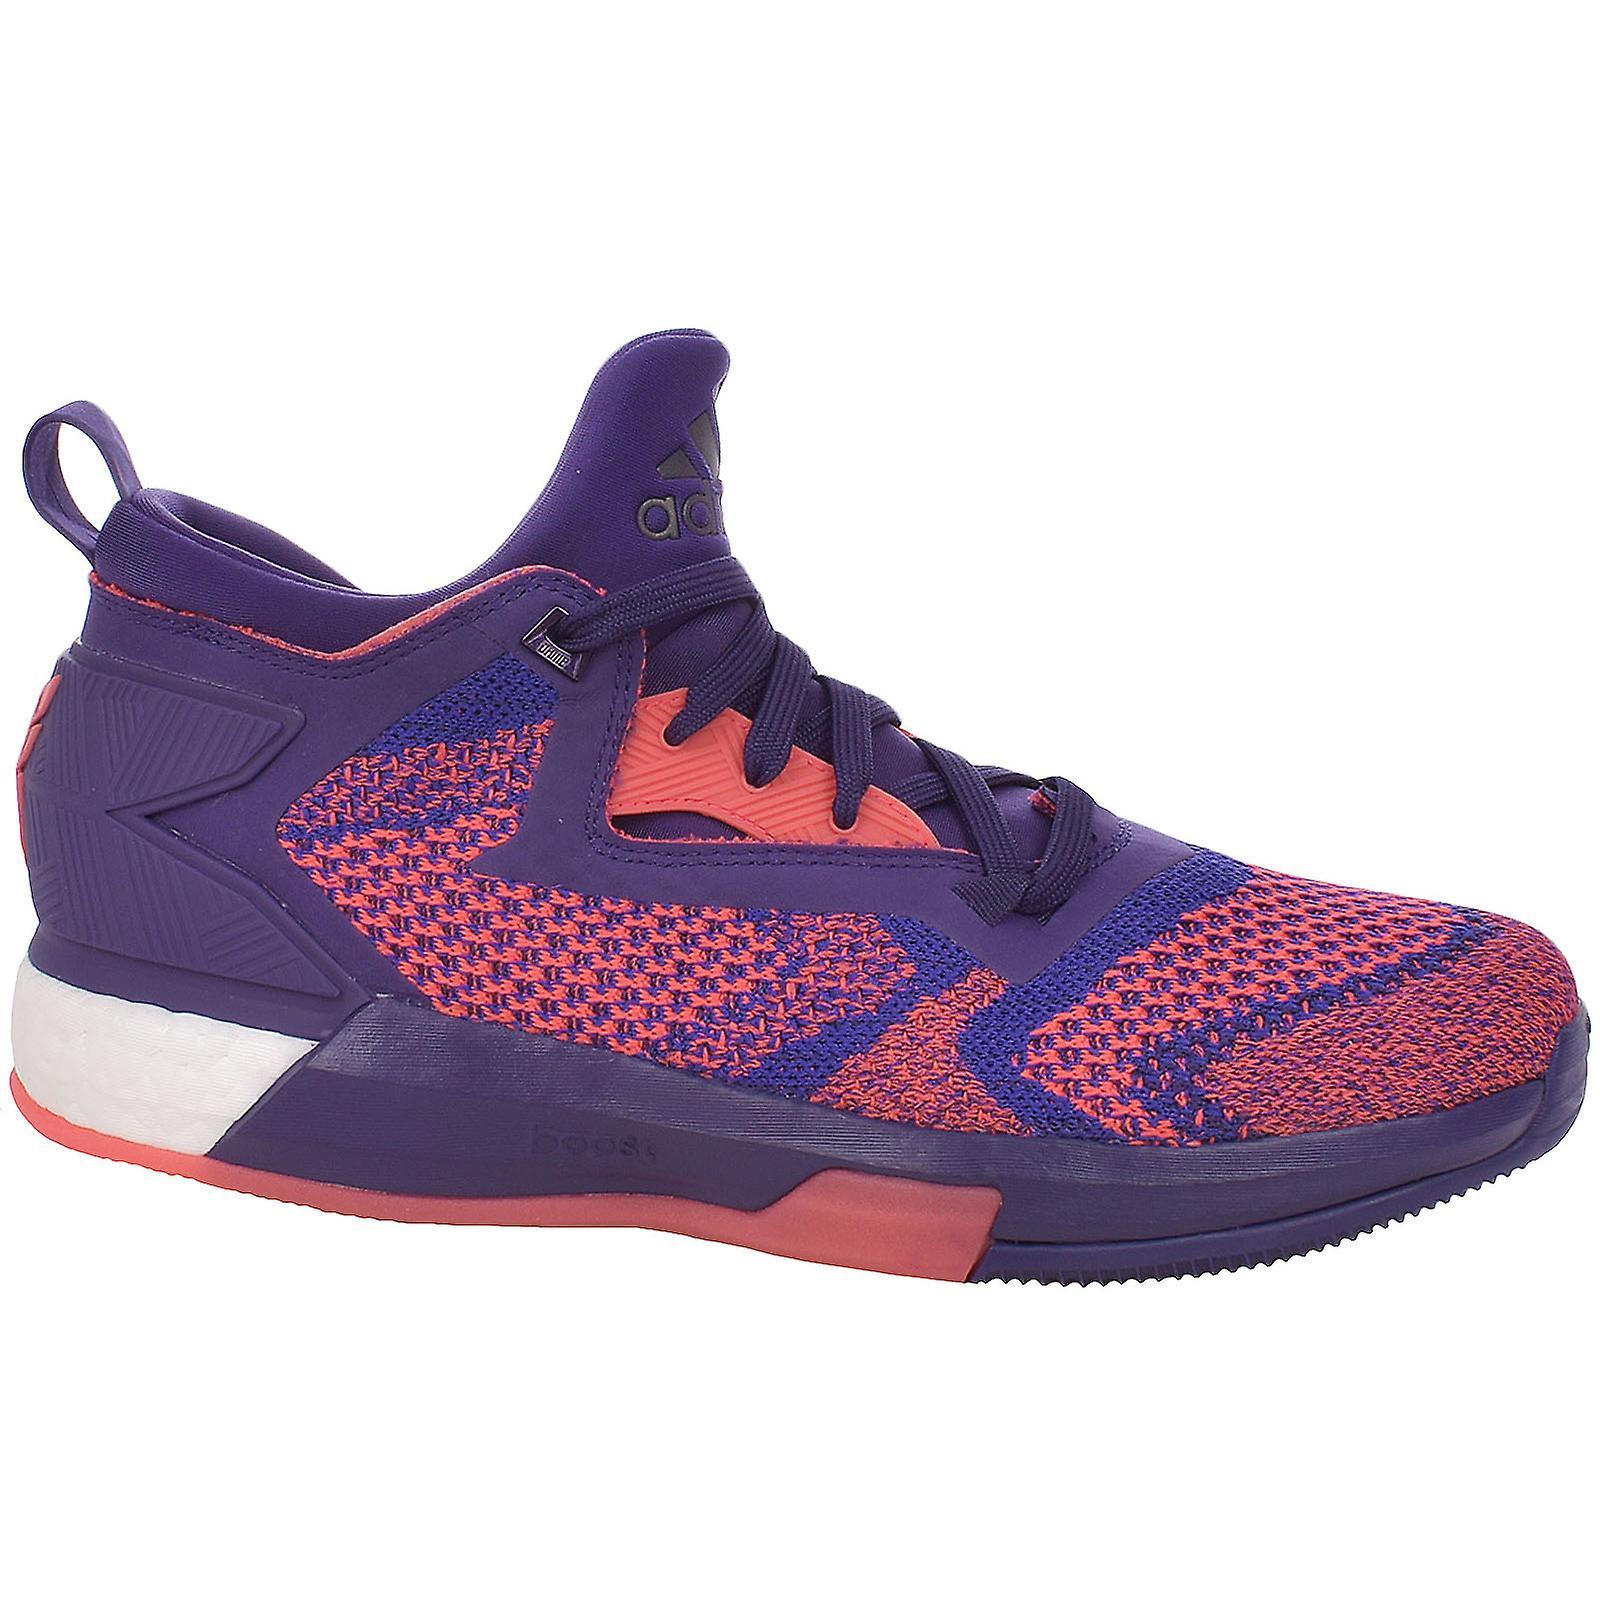 398fade14b7 adidas Performance D Lillard 2 Boost Primeknit Basketball Trainers Shoes  -Purple